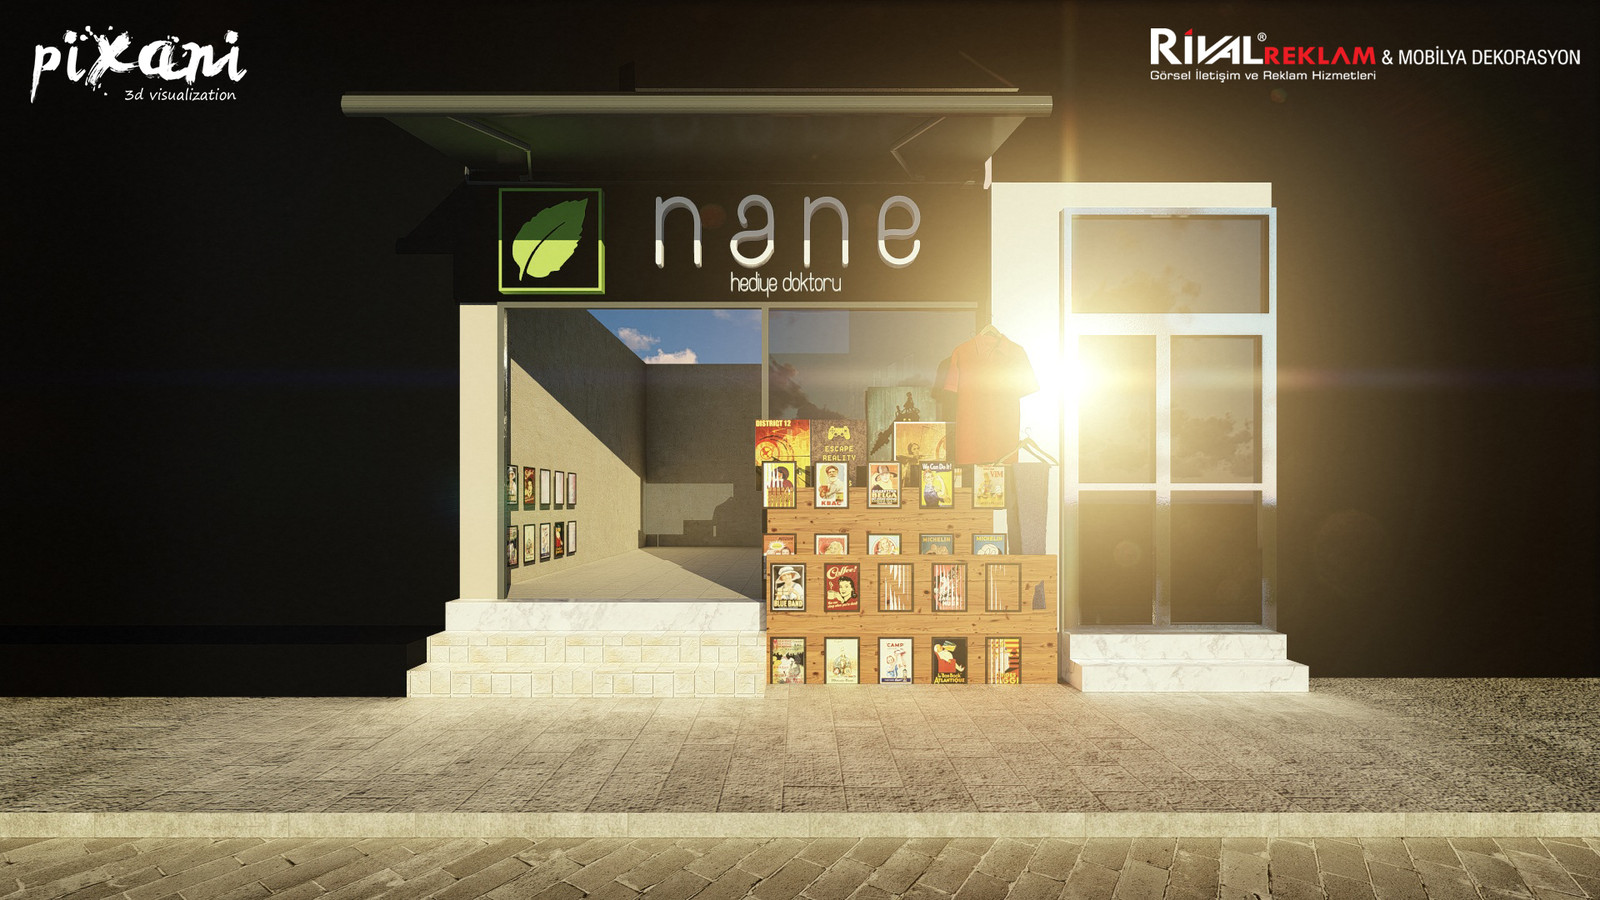 Nane-Limon Souvenir Shop is located in Kadikoy/Istanbul - Turkey.